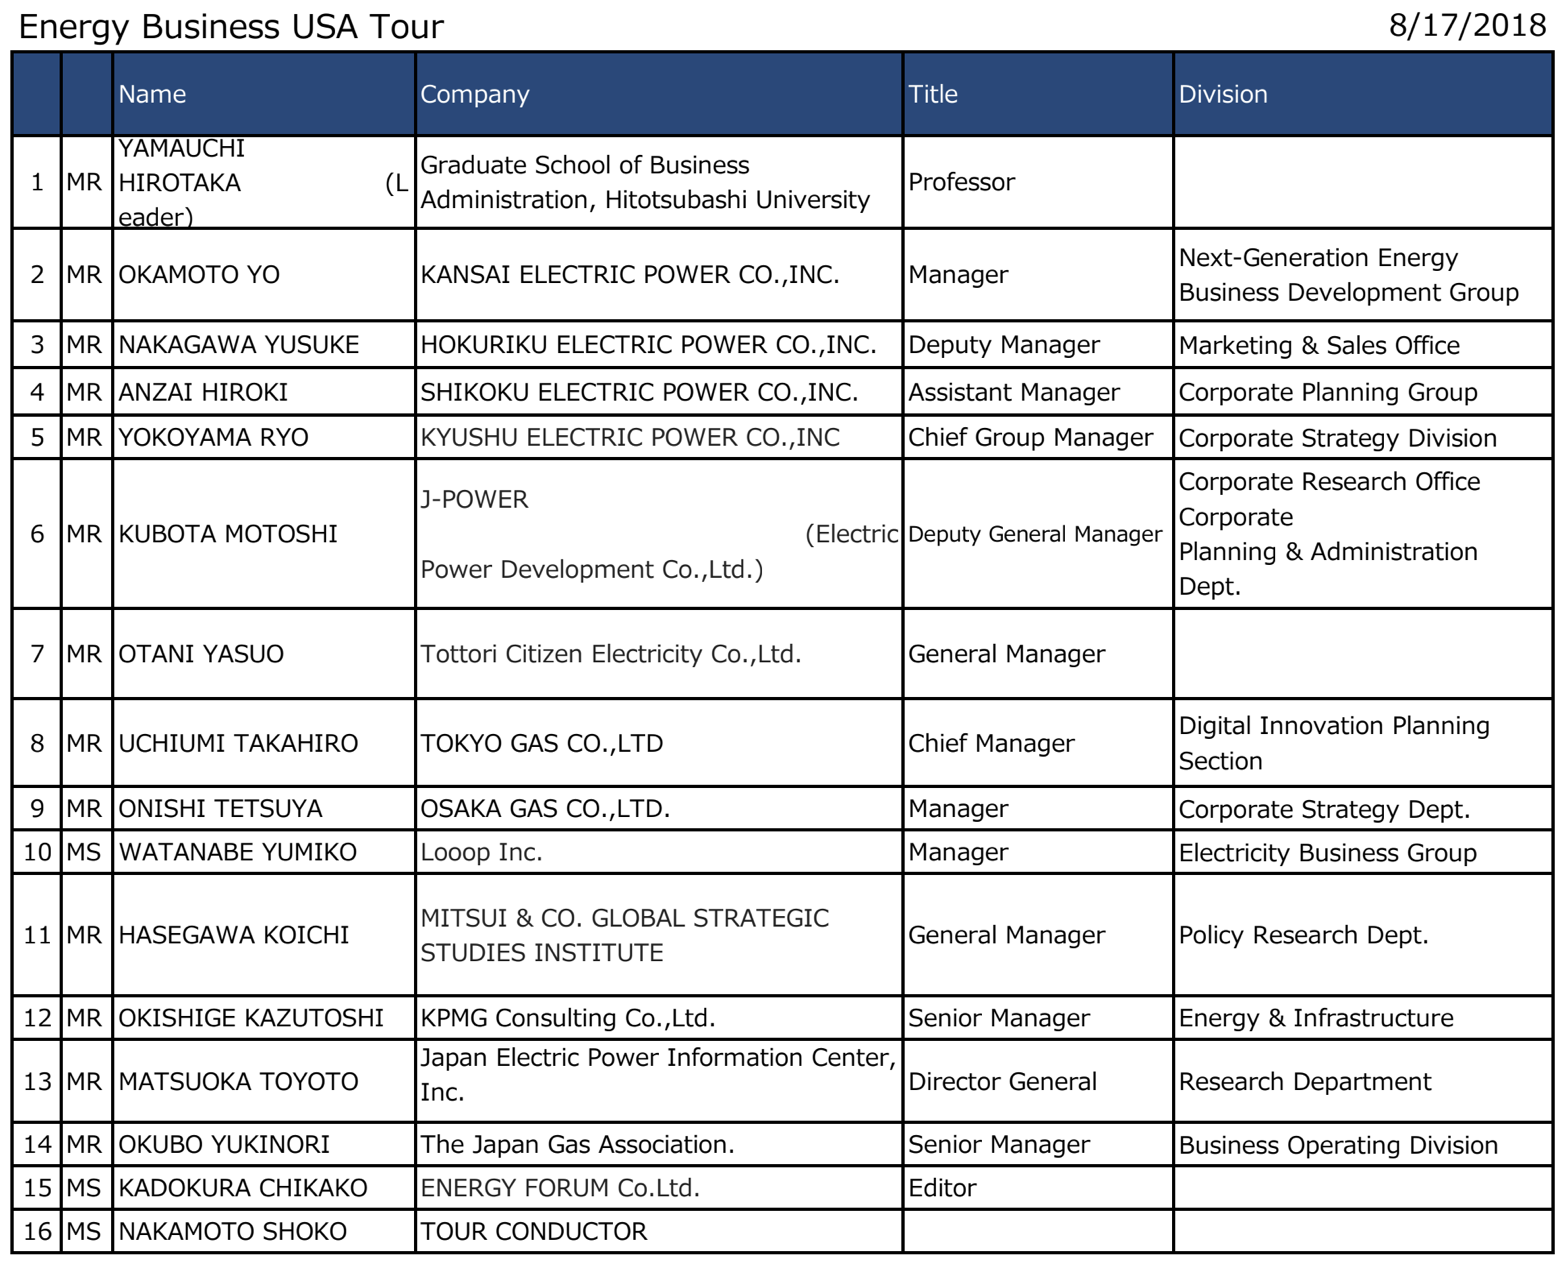 Japan's Energy Business USA Tour guest list